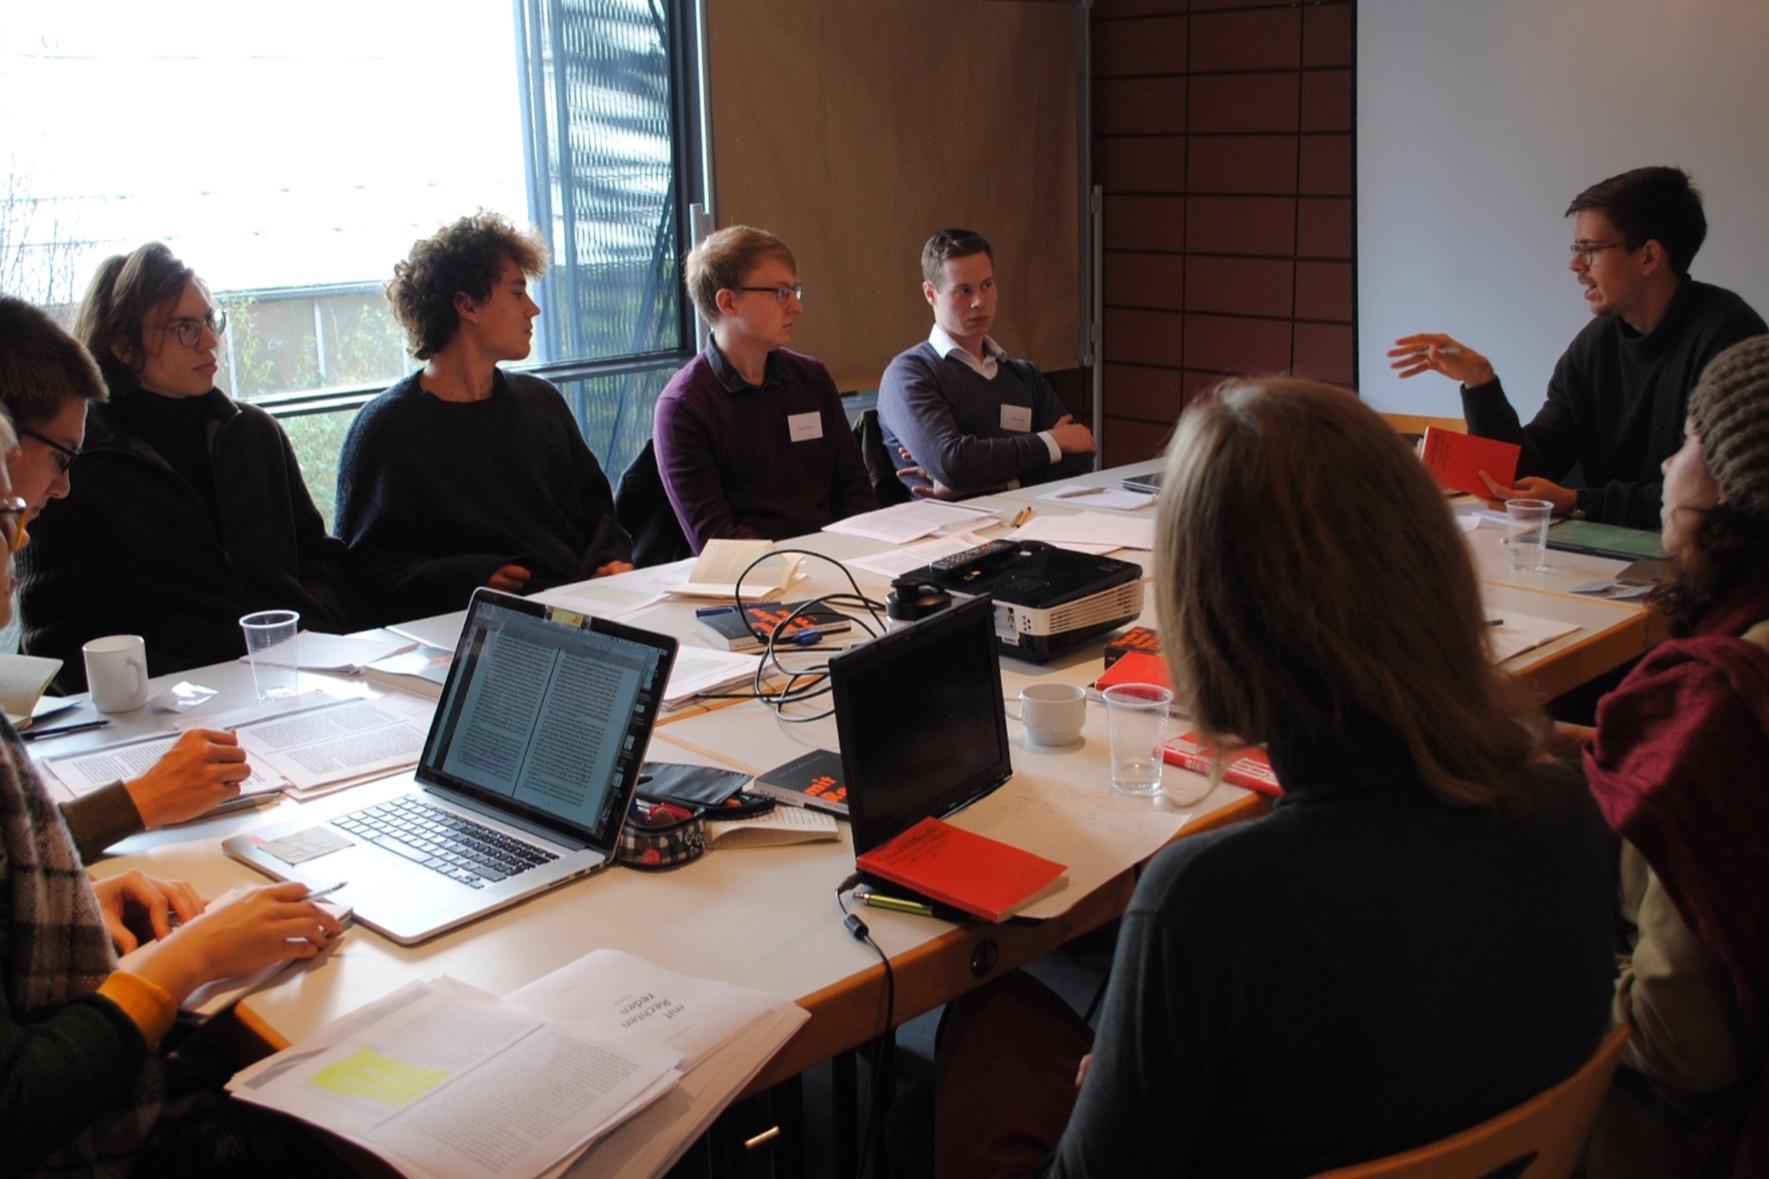 Diskutiert wurden Bücher von Chantal Mouffe und Daniel-Pascal Zorn